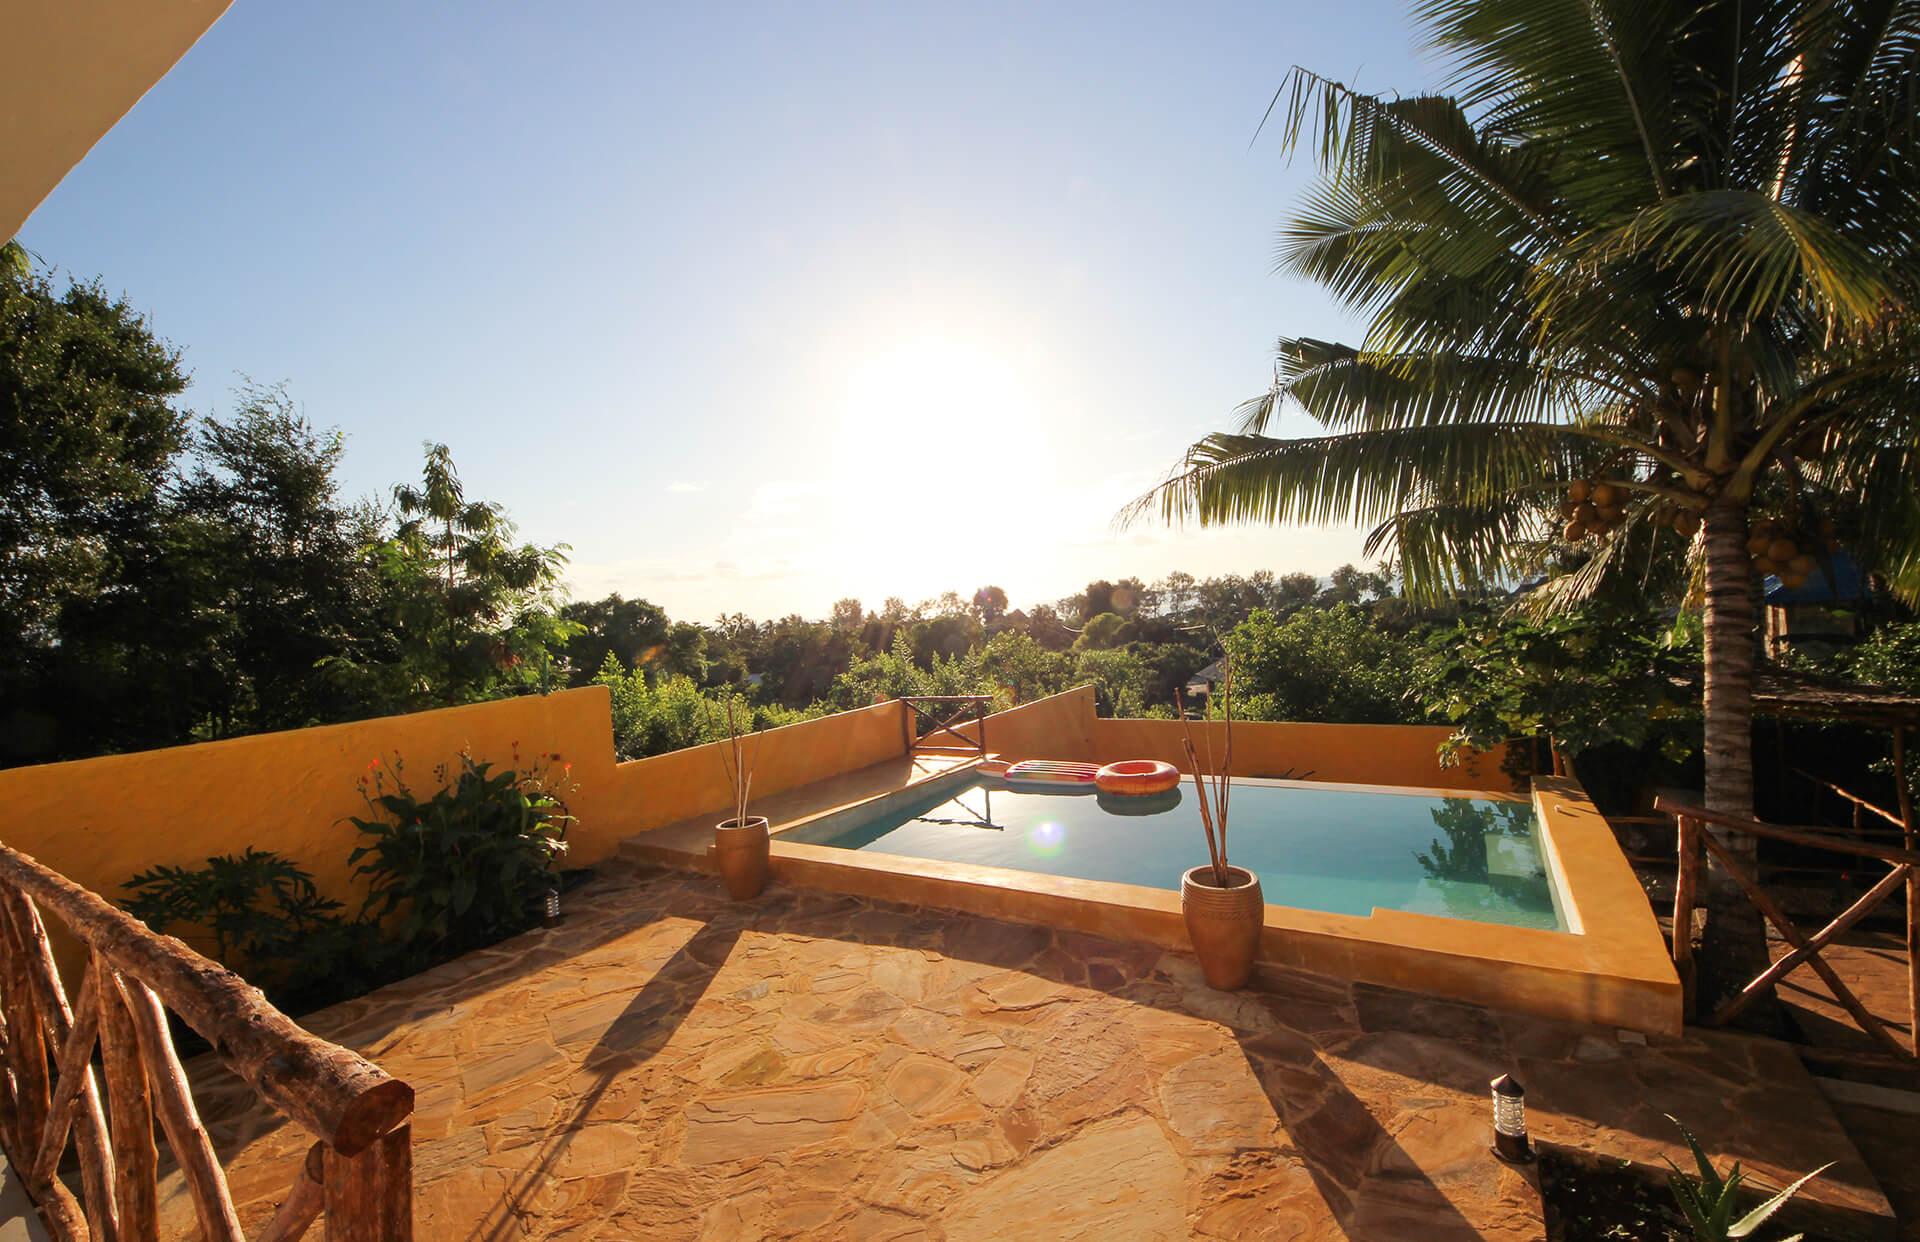 piscina per le tue vacanze a zanzibar